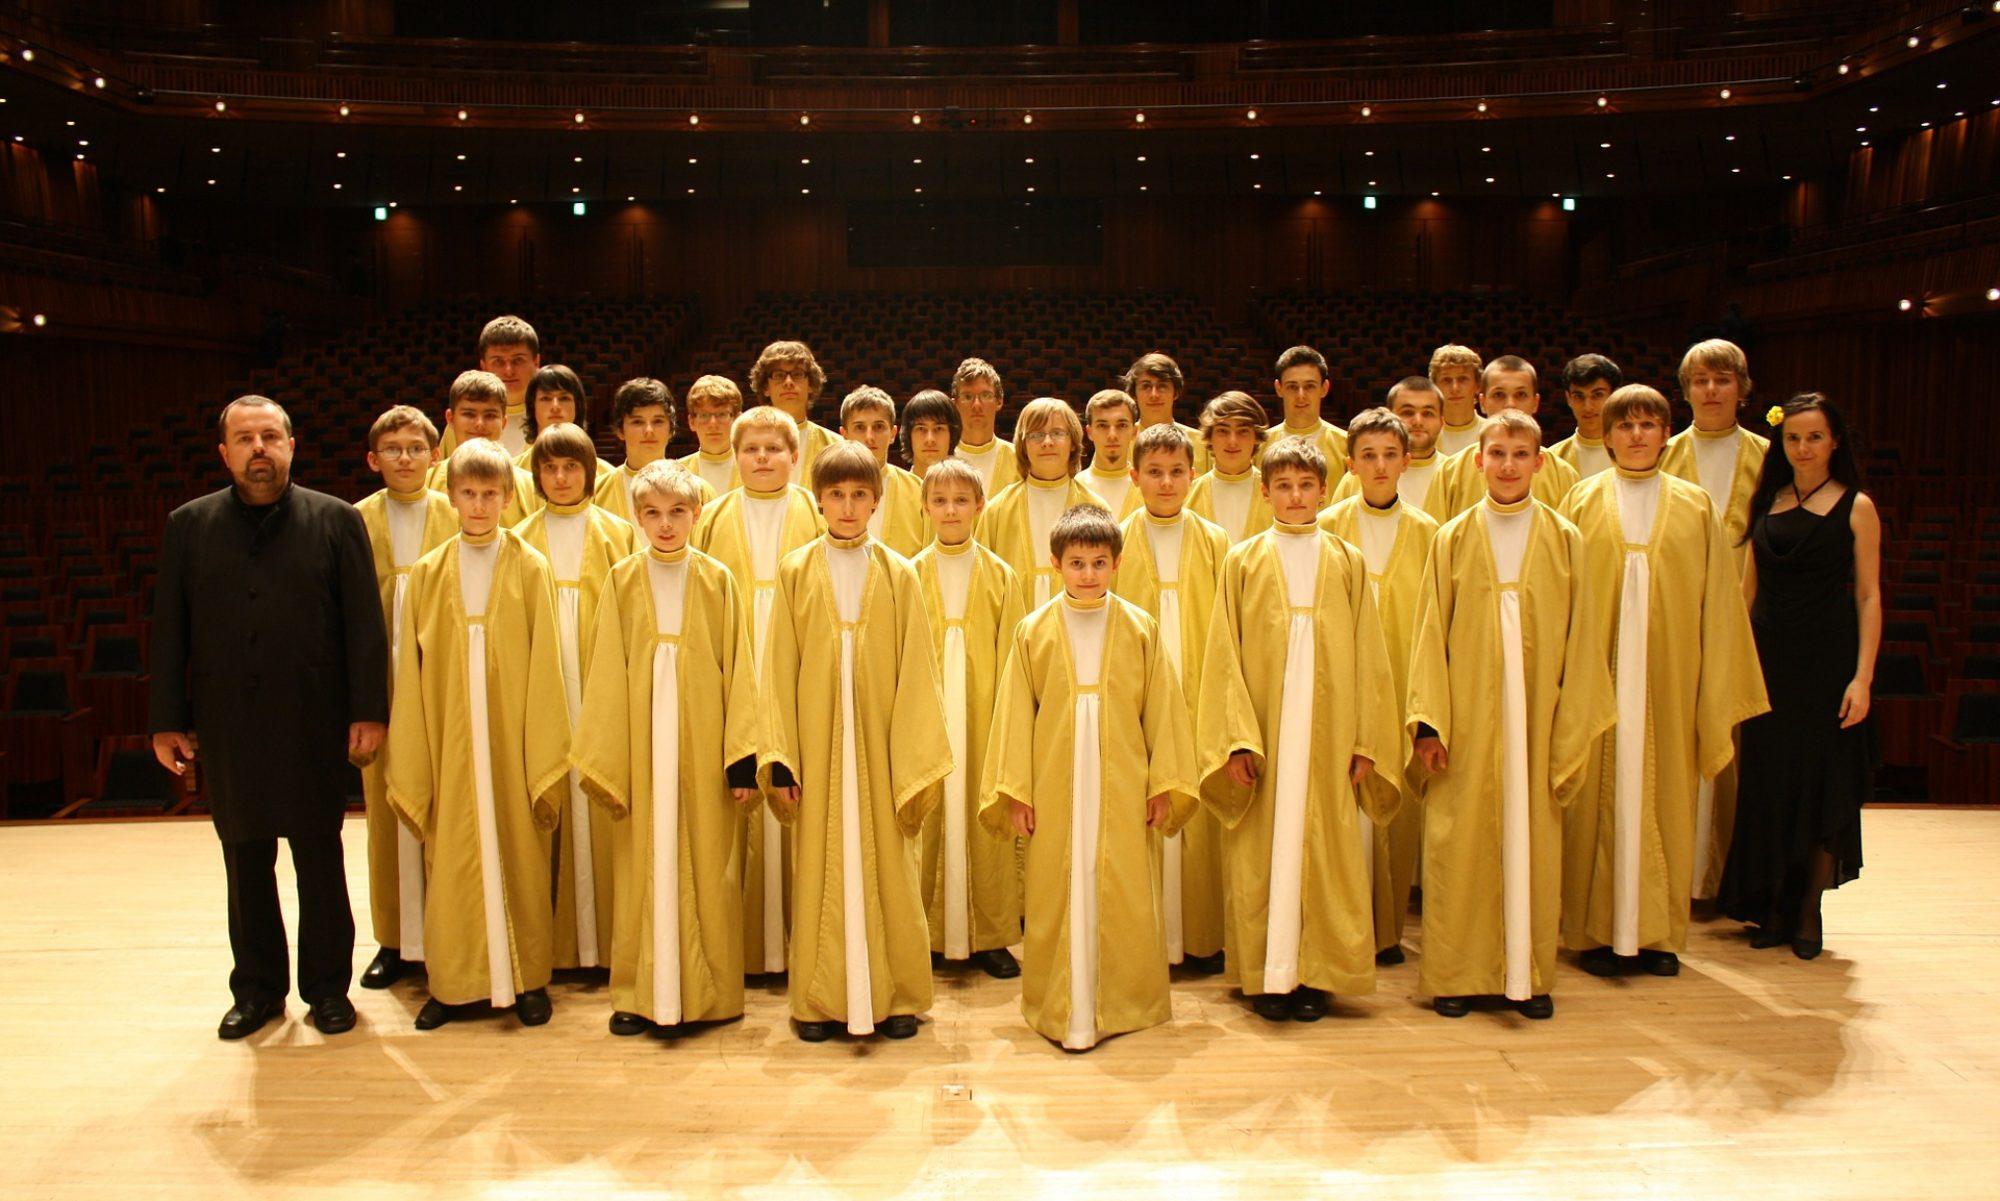 ChoirPhilharmonic.cz